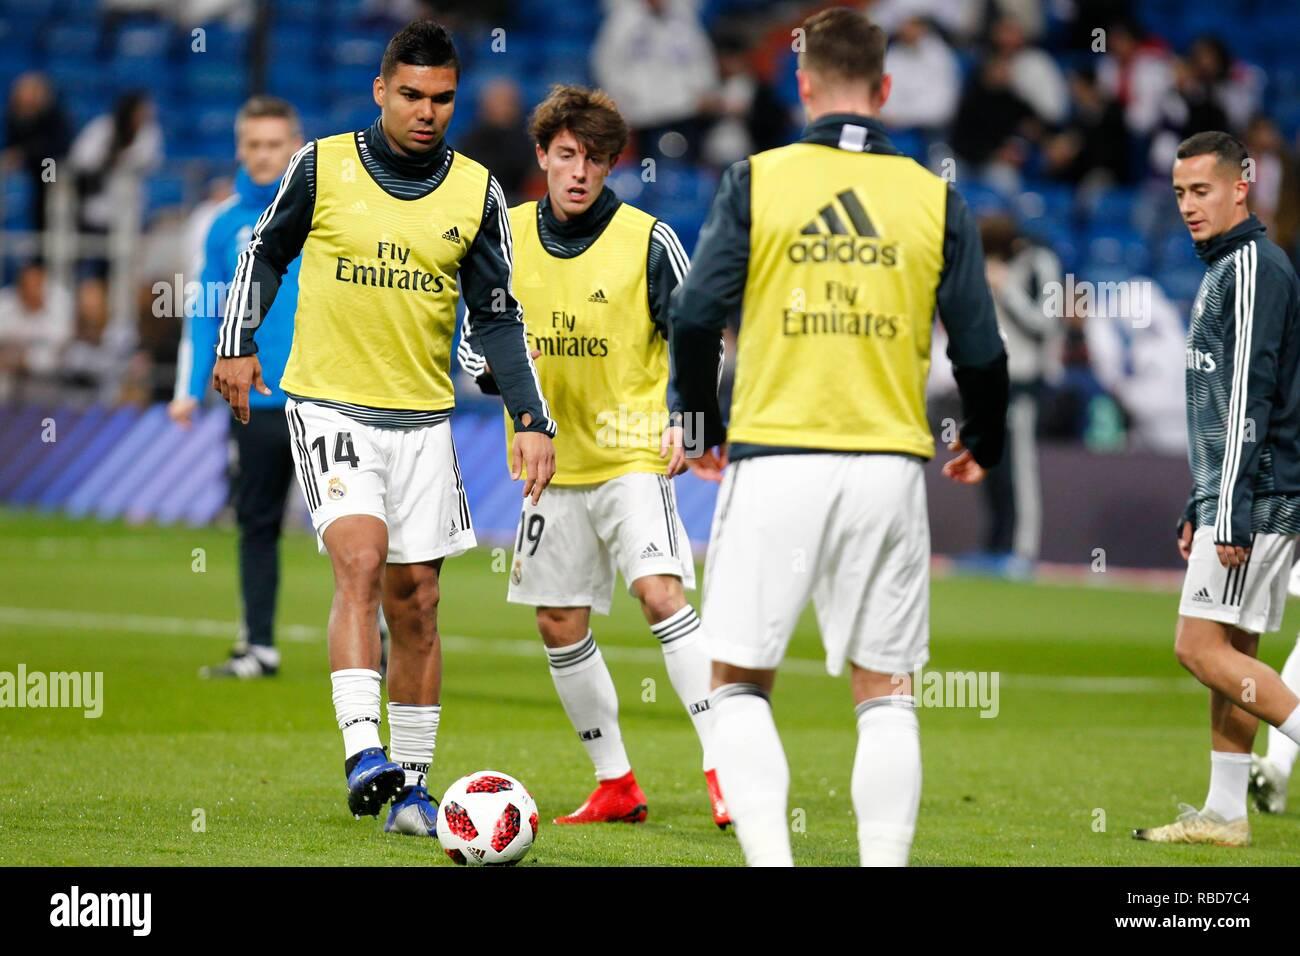 Madrid Spain 9th Jan 2019 Soccer Match Between Real Madrid Vs